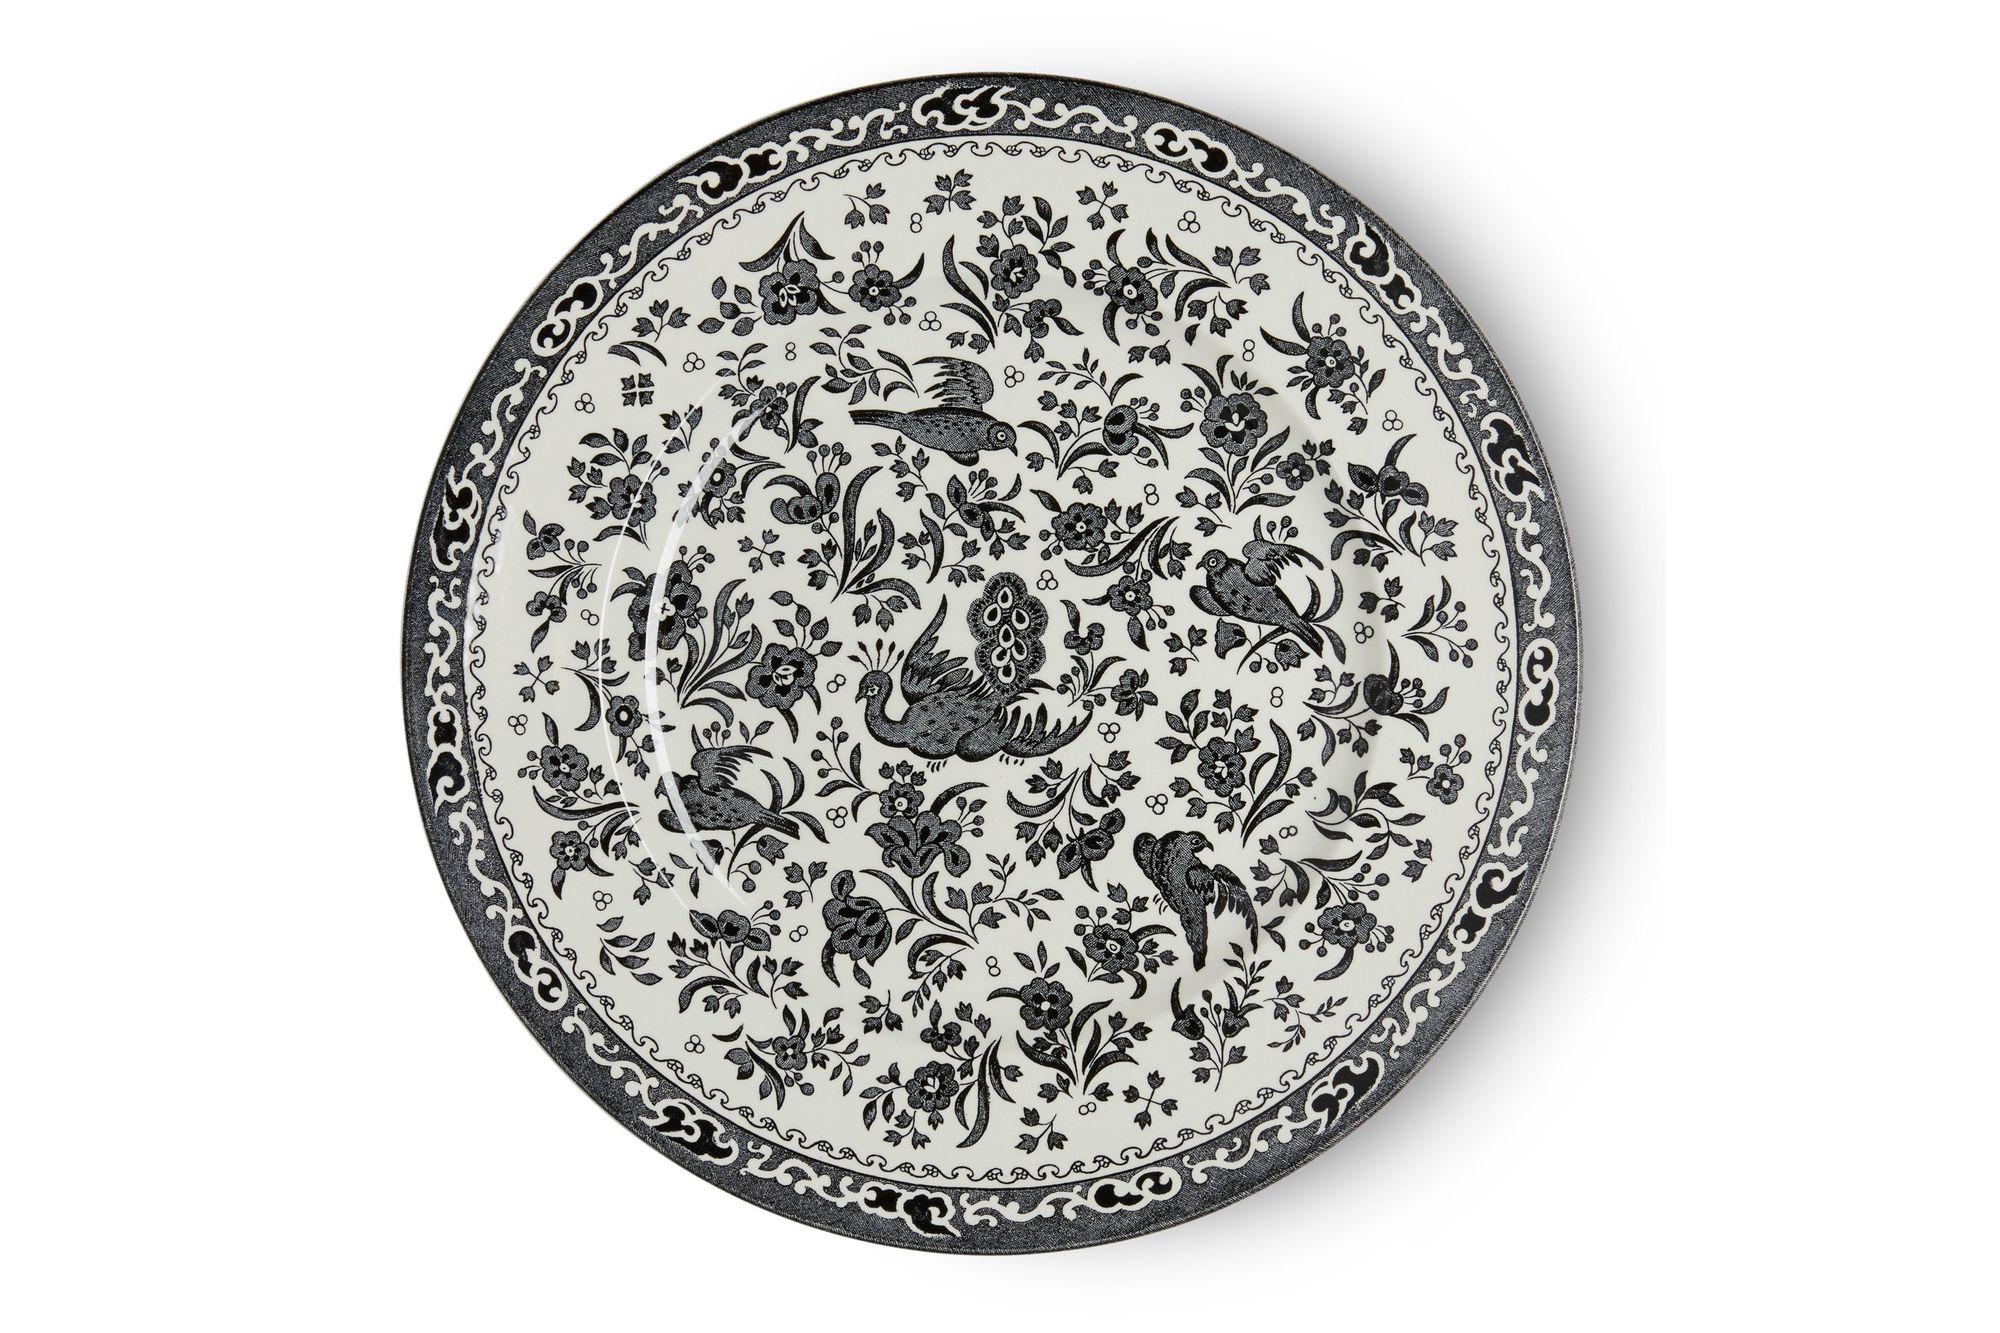 Burleigh Black Regal Peacock Dinner Plate 25cm thumb 2